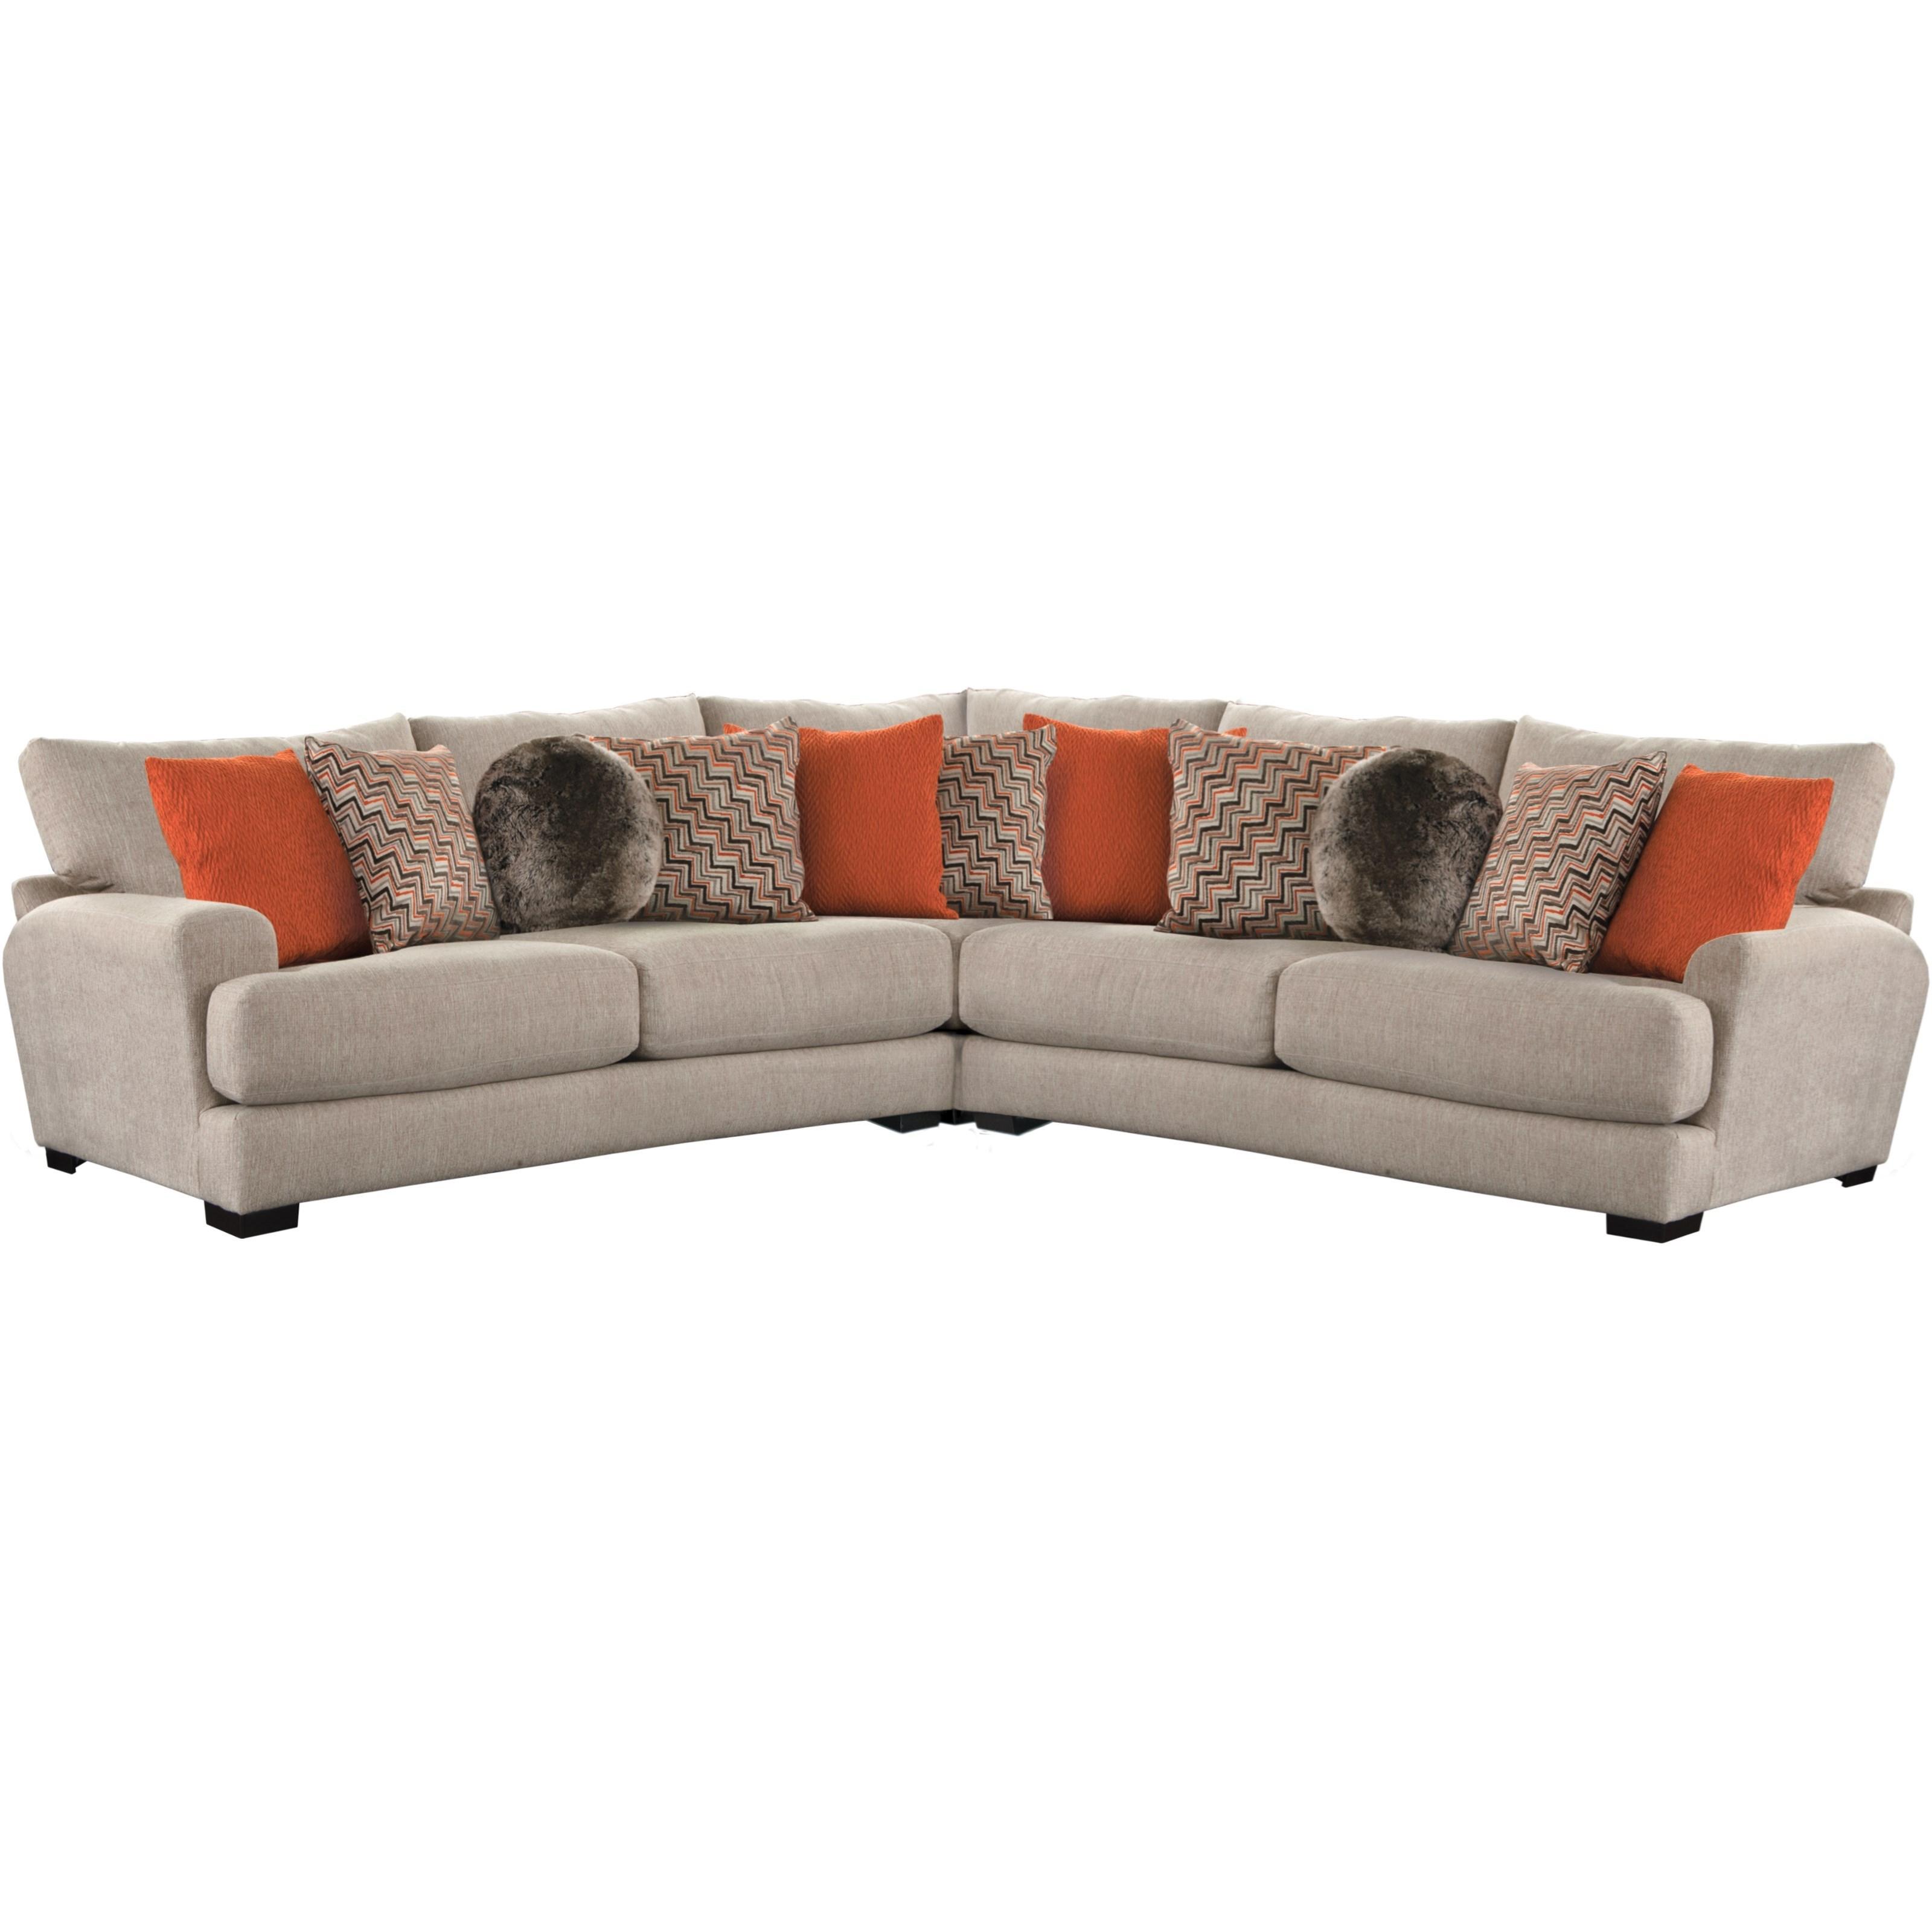 Jackson Furniture AvaSectional Sofa With 4 Seats U0026 USB Ports